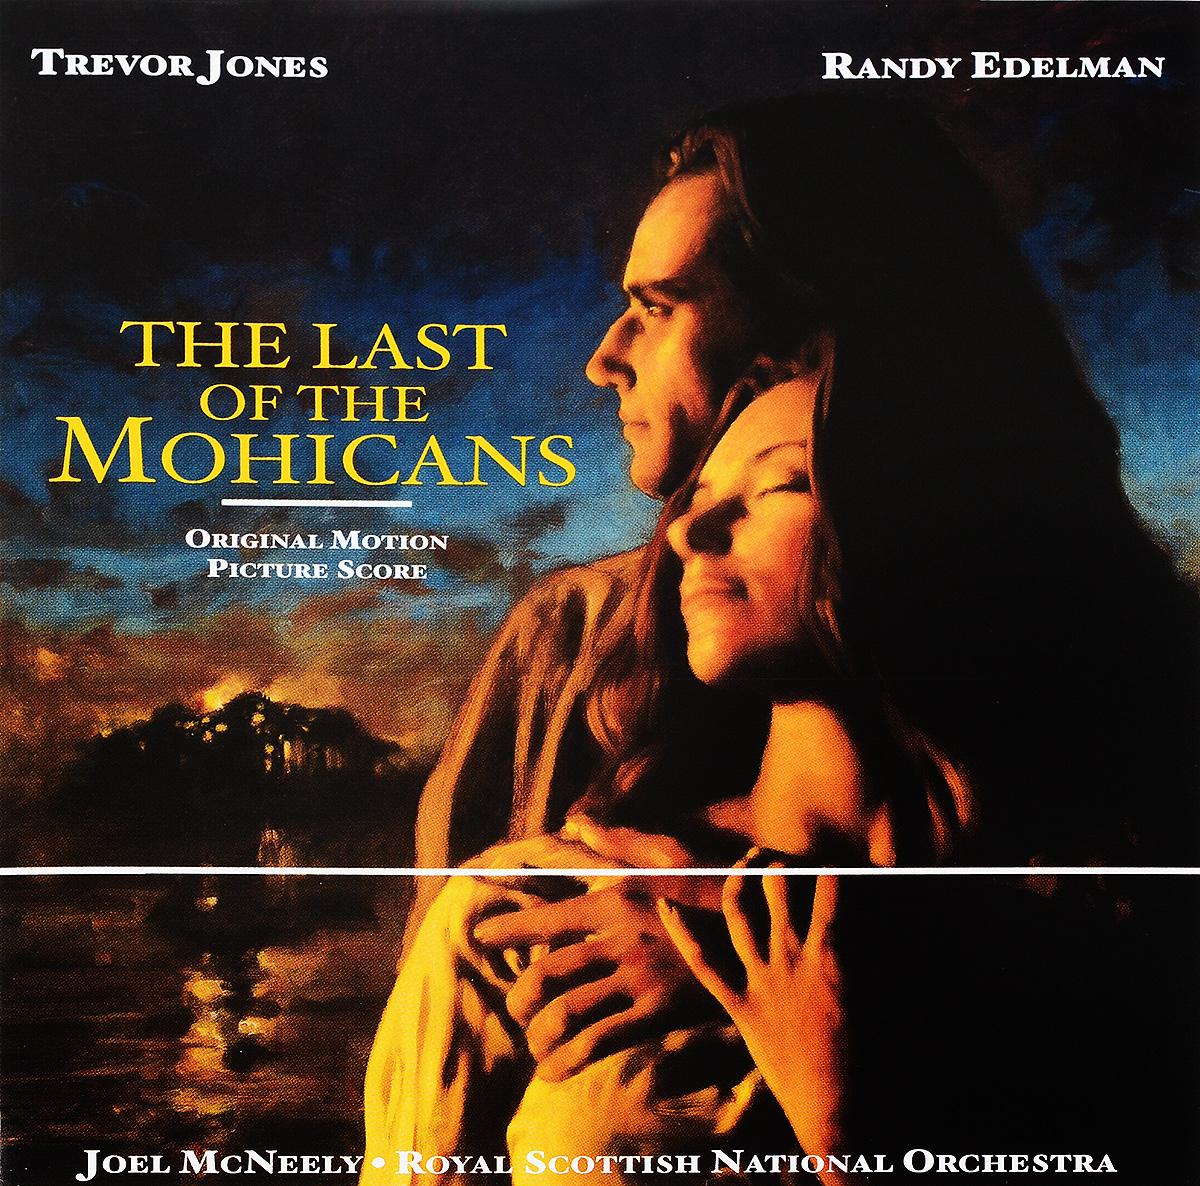 Джоэл Макнили,Royal Scottish National Orchestra Trevor Jones, Randy Edelman. The Last Of The Mohicans: Original Motion Picture Score the spy who loved me original motion picture score lp